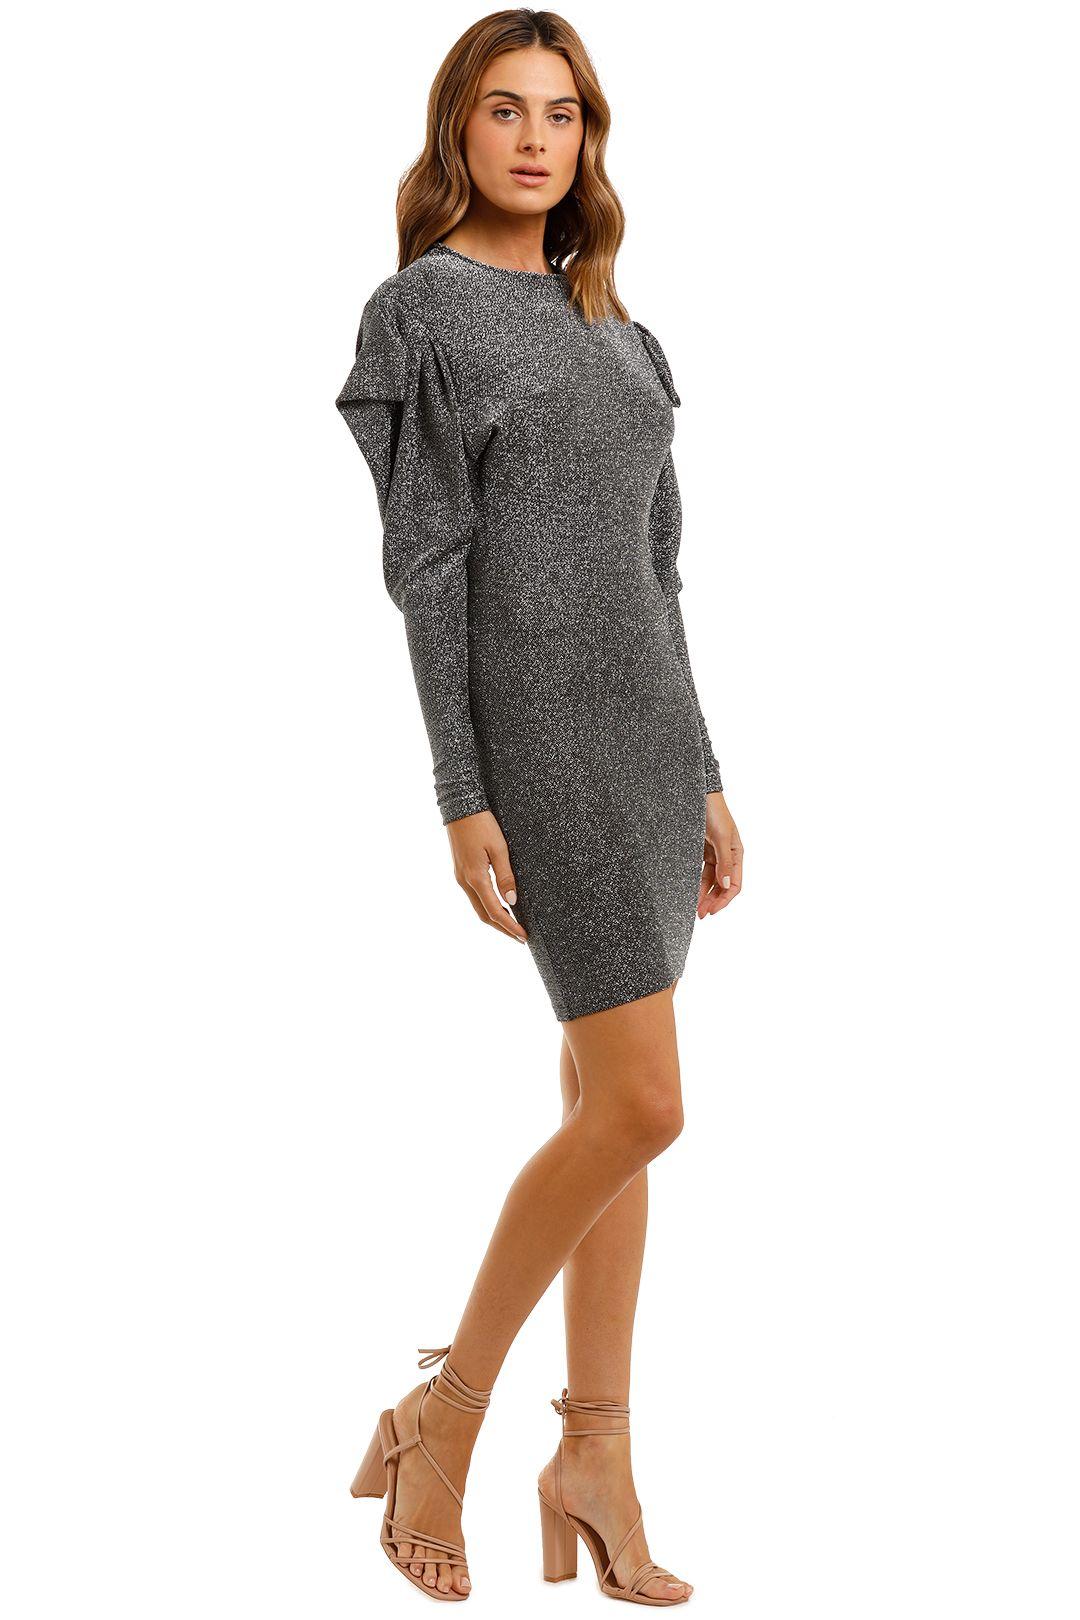 Isabel Marant Waden Dress long sleeve